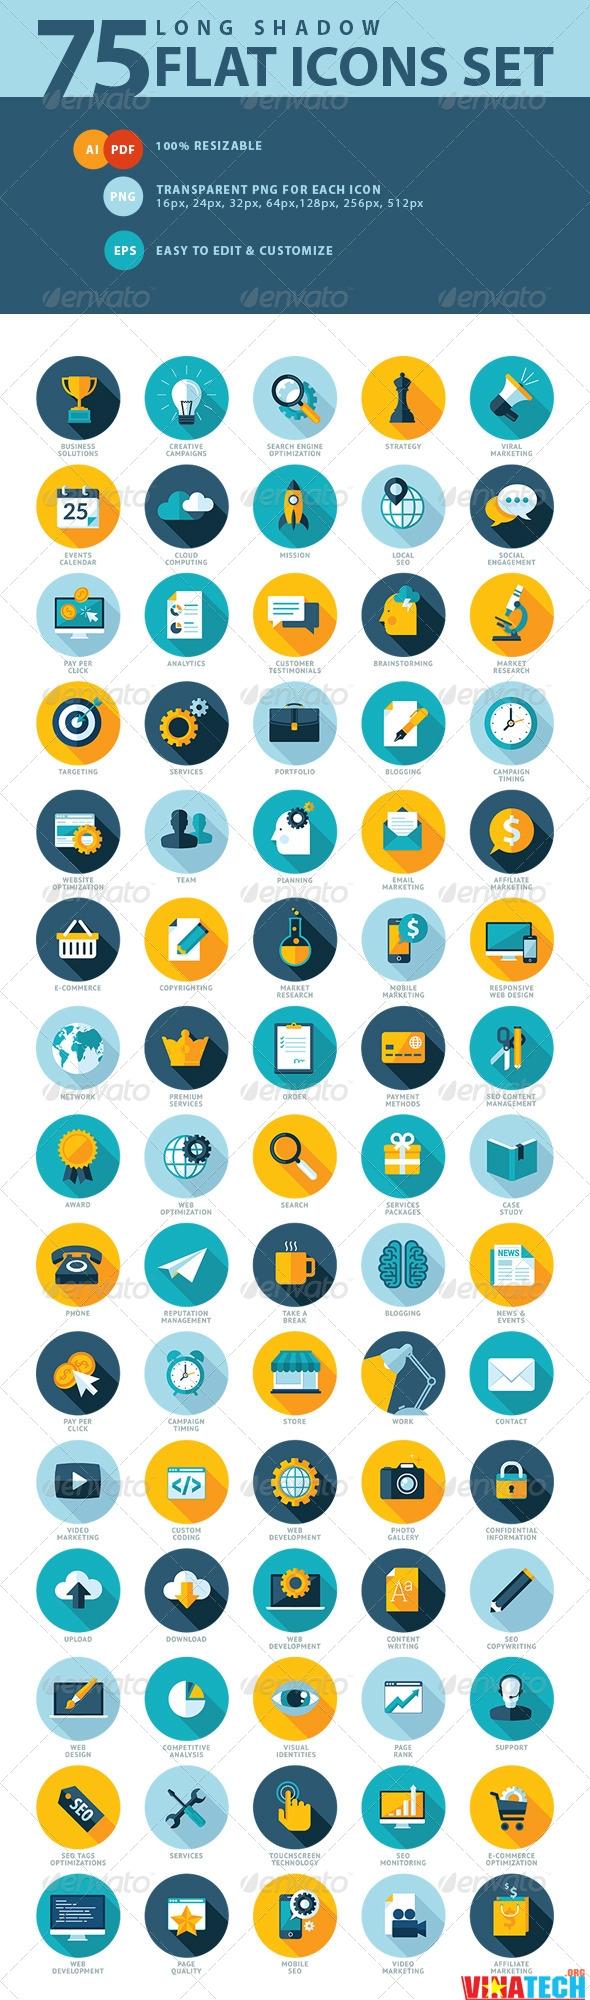 Download 75 mẫu icon Seo services Flat Design